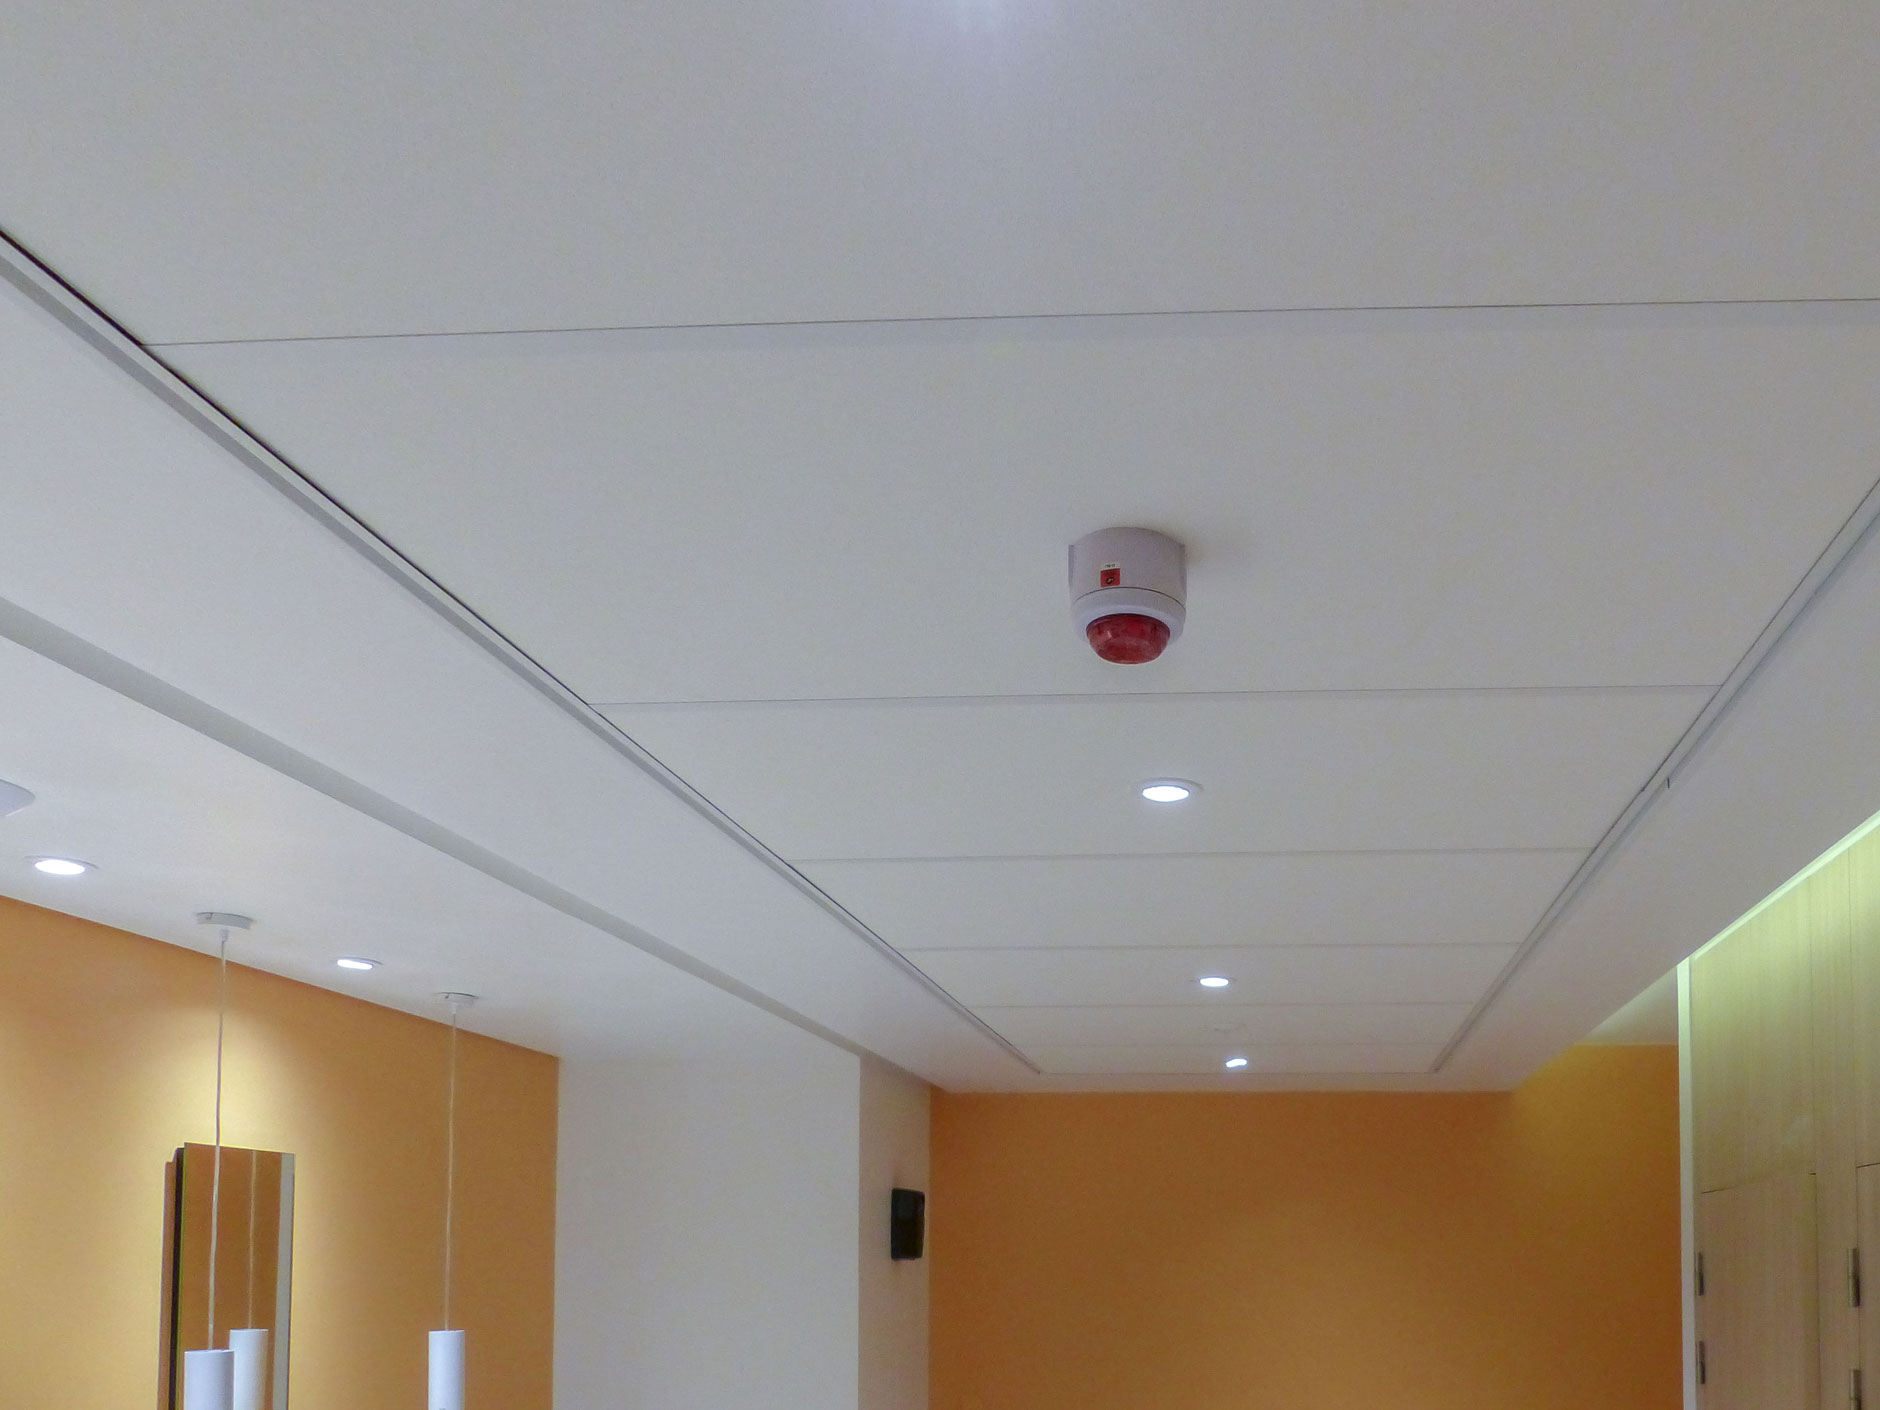 Solaris Plafonds Interieurs Hygiene Performance Langlois Sobreti Idf